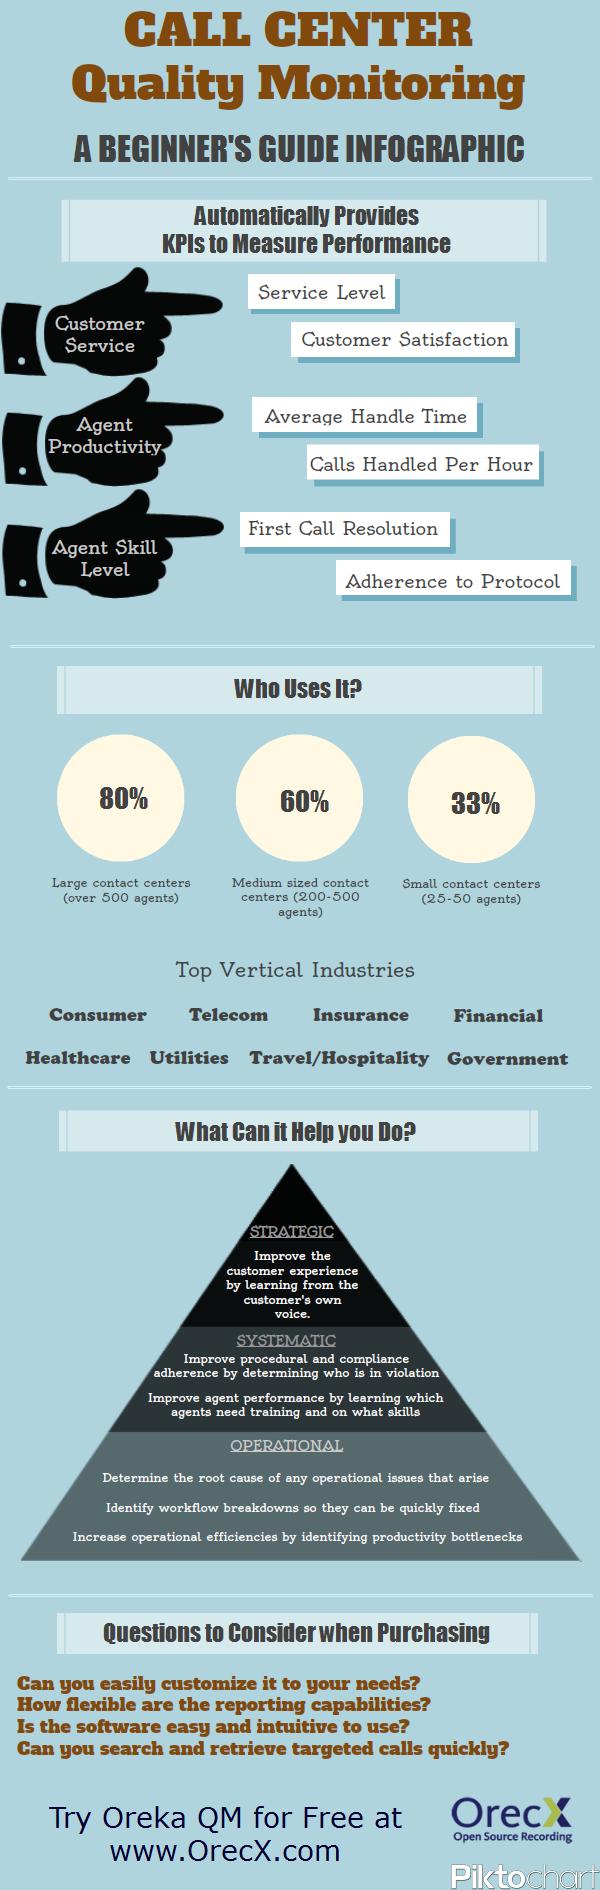 OrecX_QM_Infographic-3